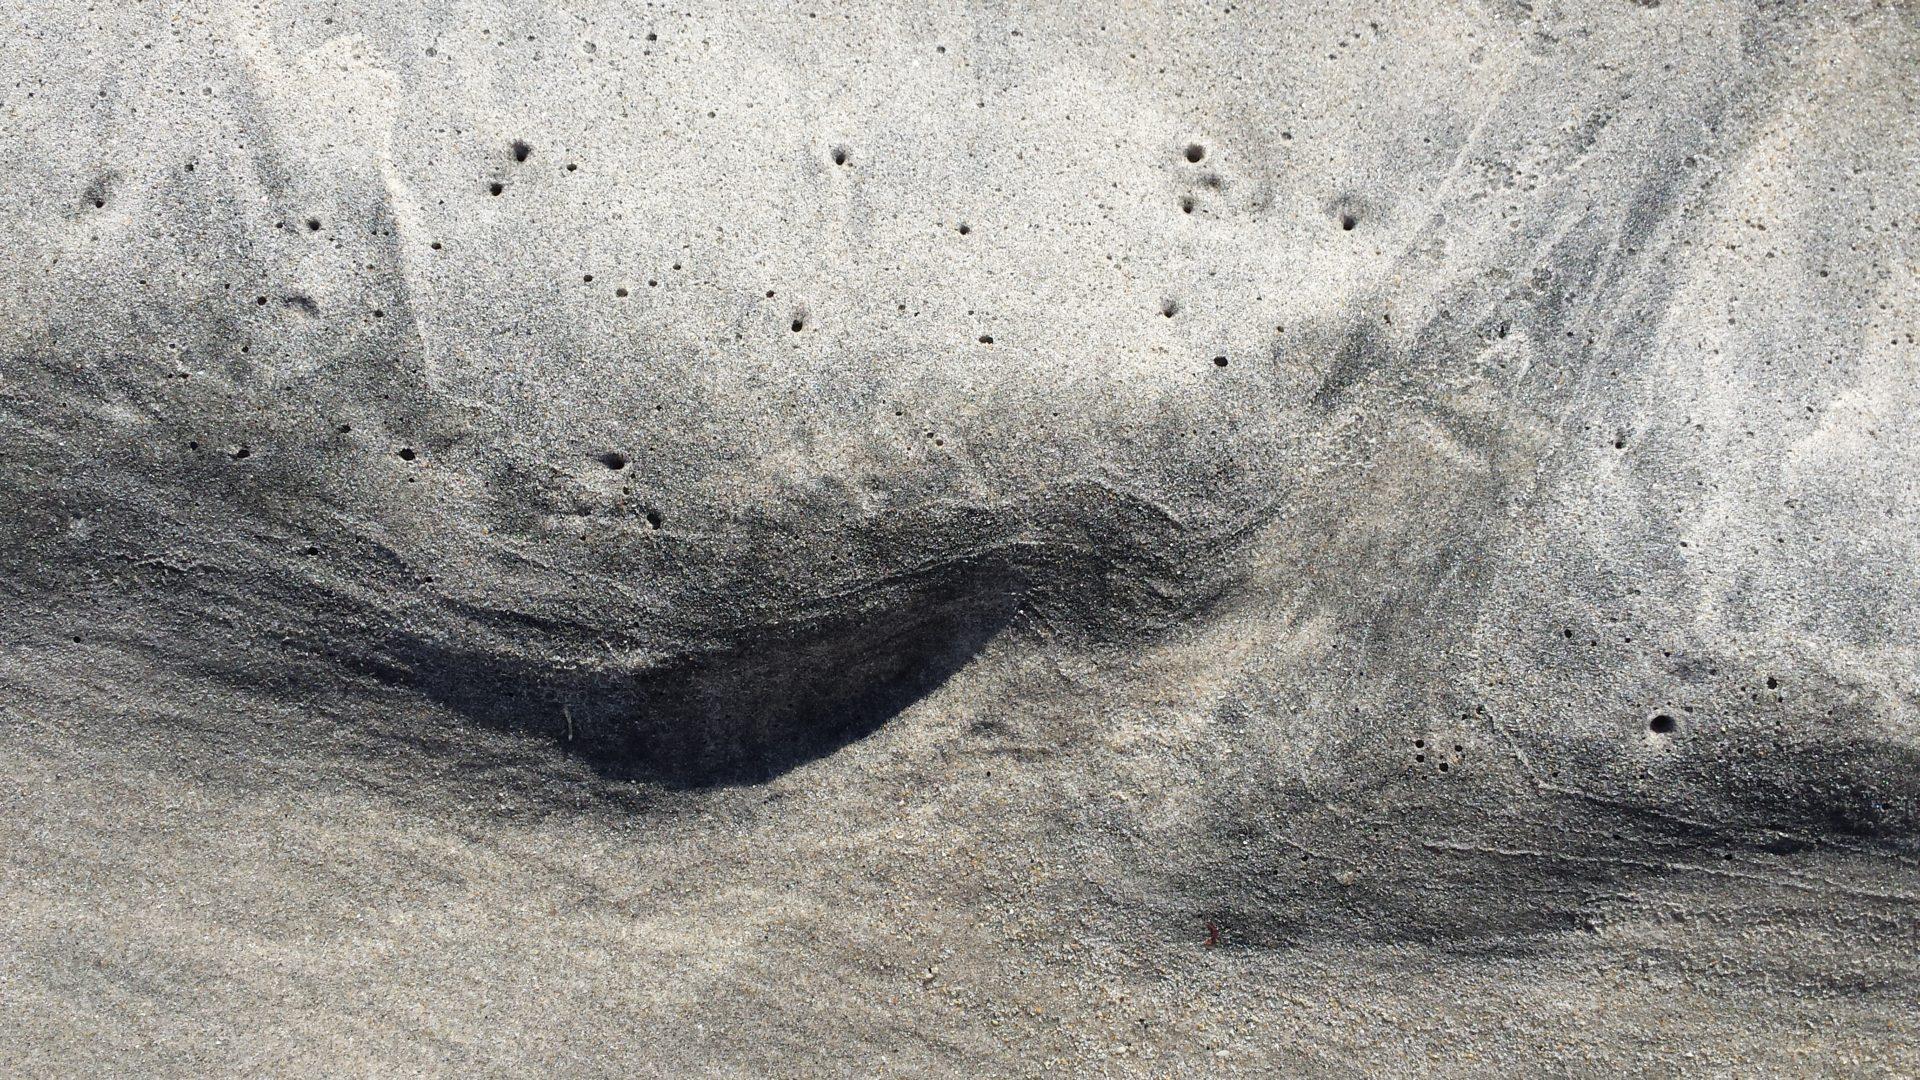 Microcosmic Landscape